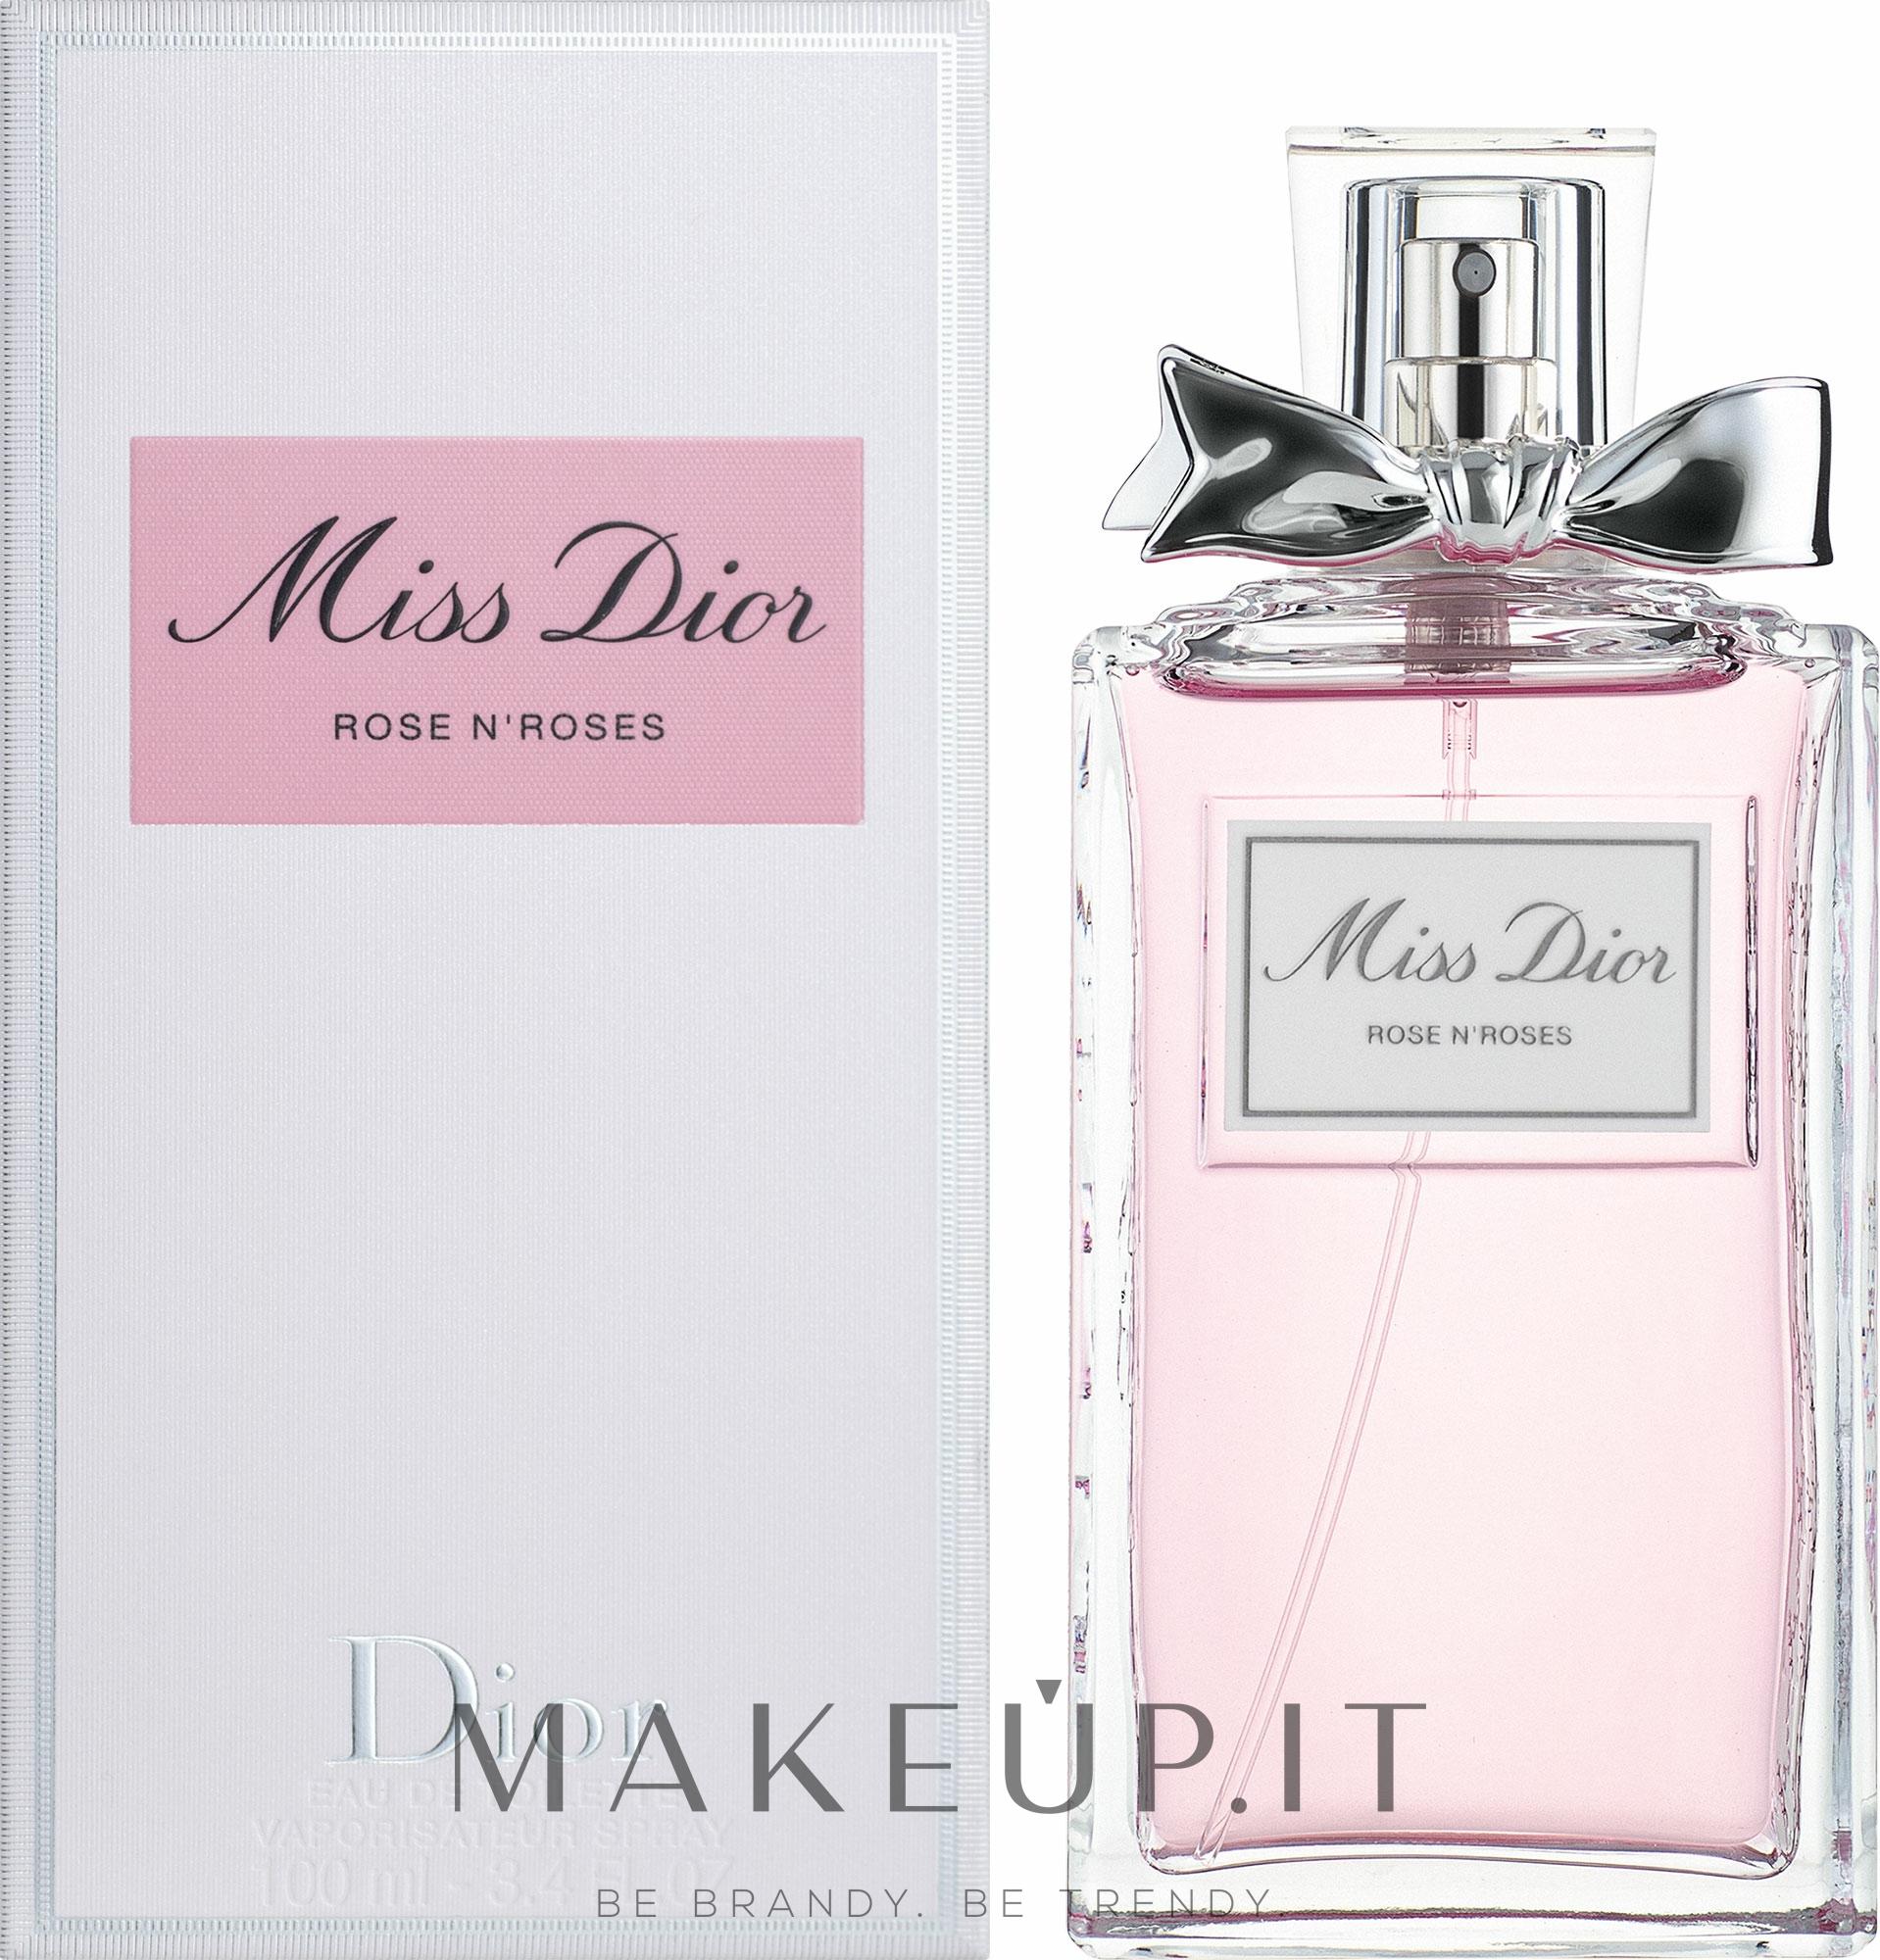 Dior Miss Dior Rose N'Roses - Eau de toilette — foto 100 ml